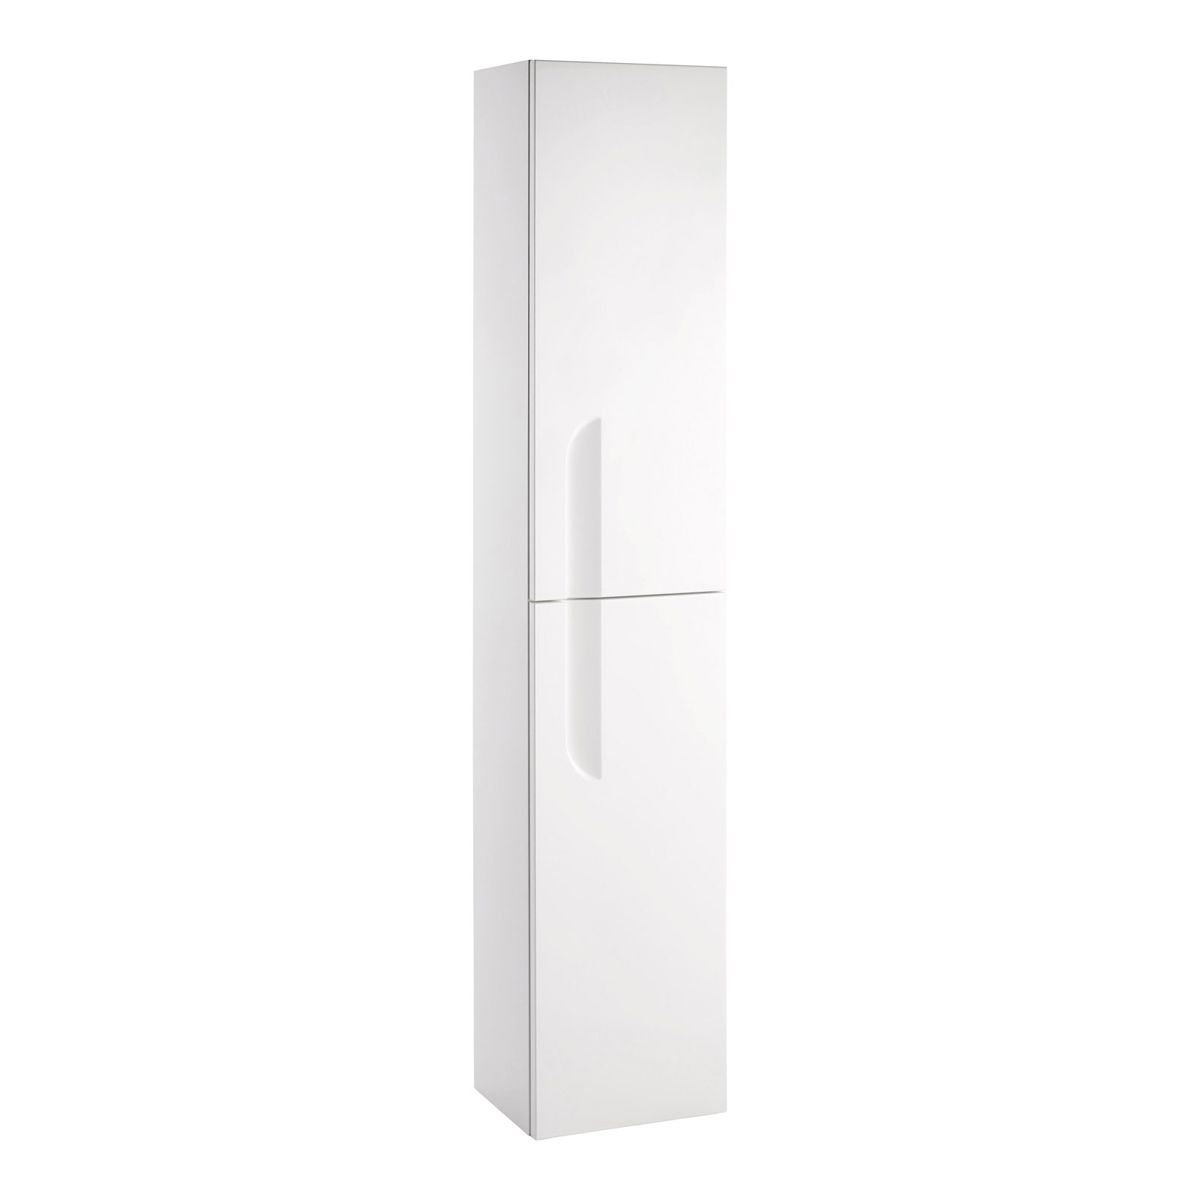 Frontline Vitale Gloss White Tall Wall Unit